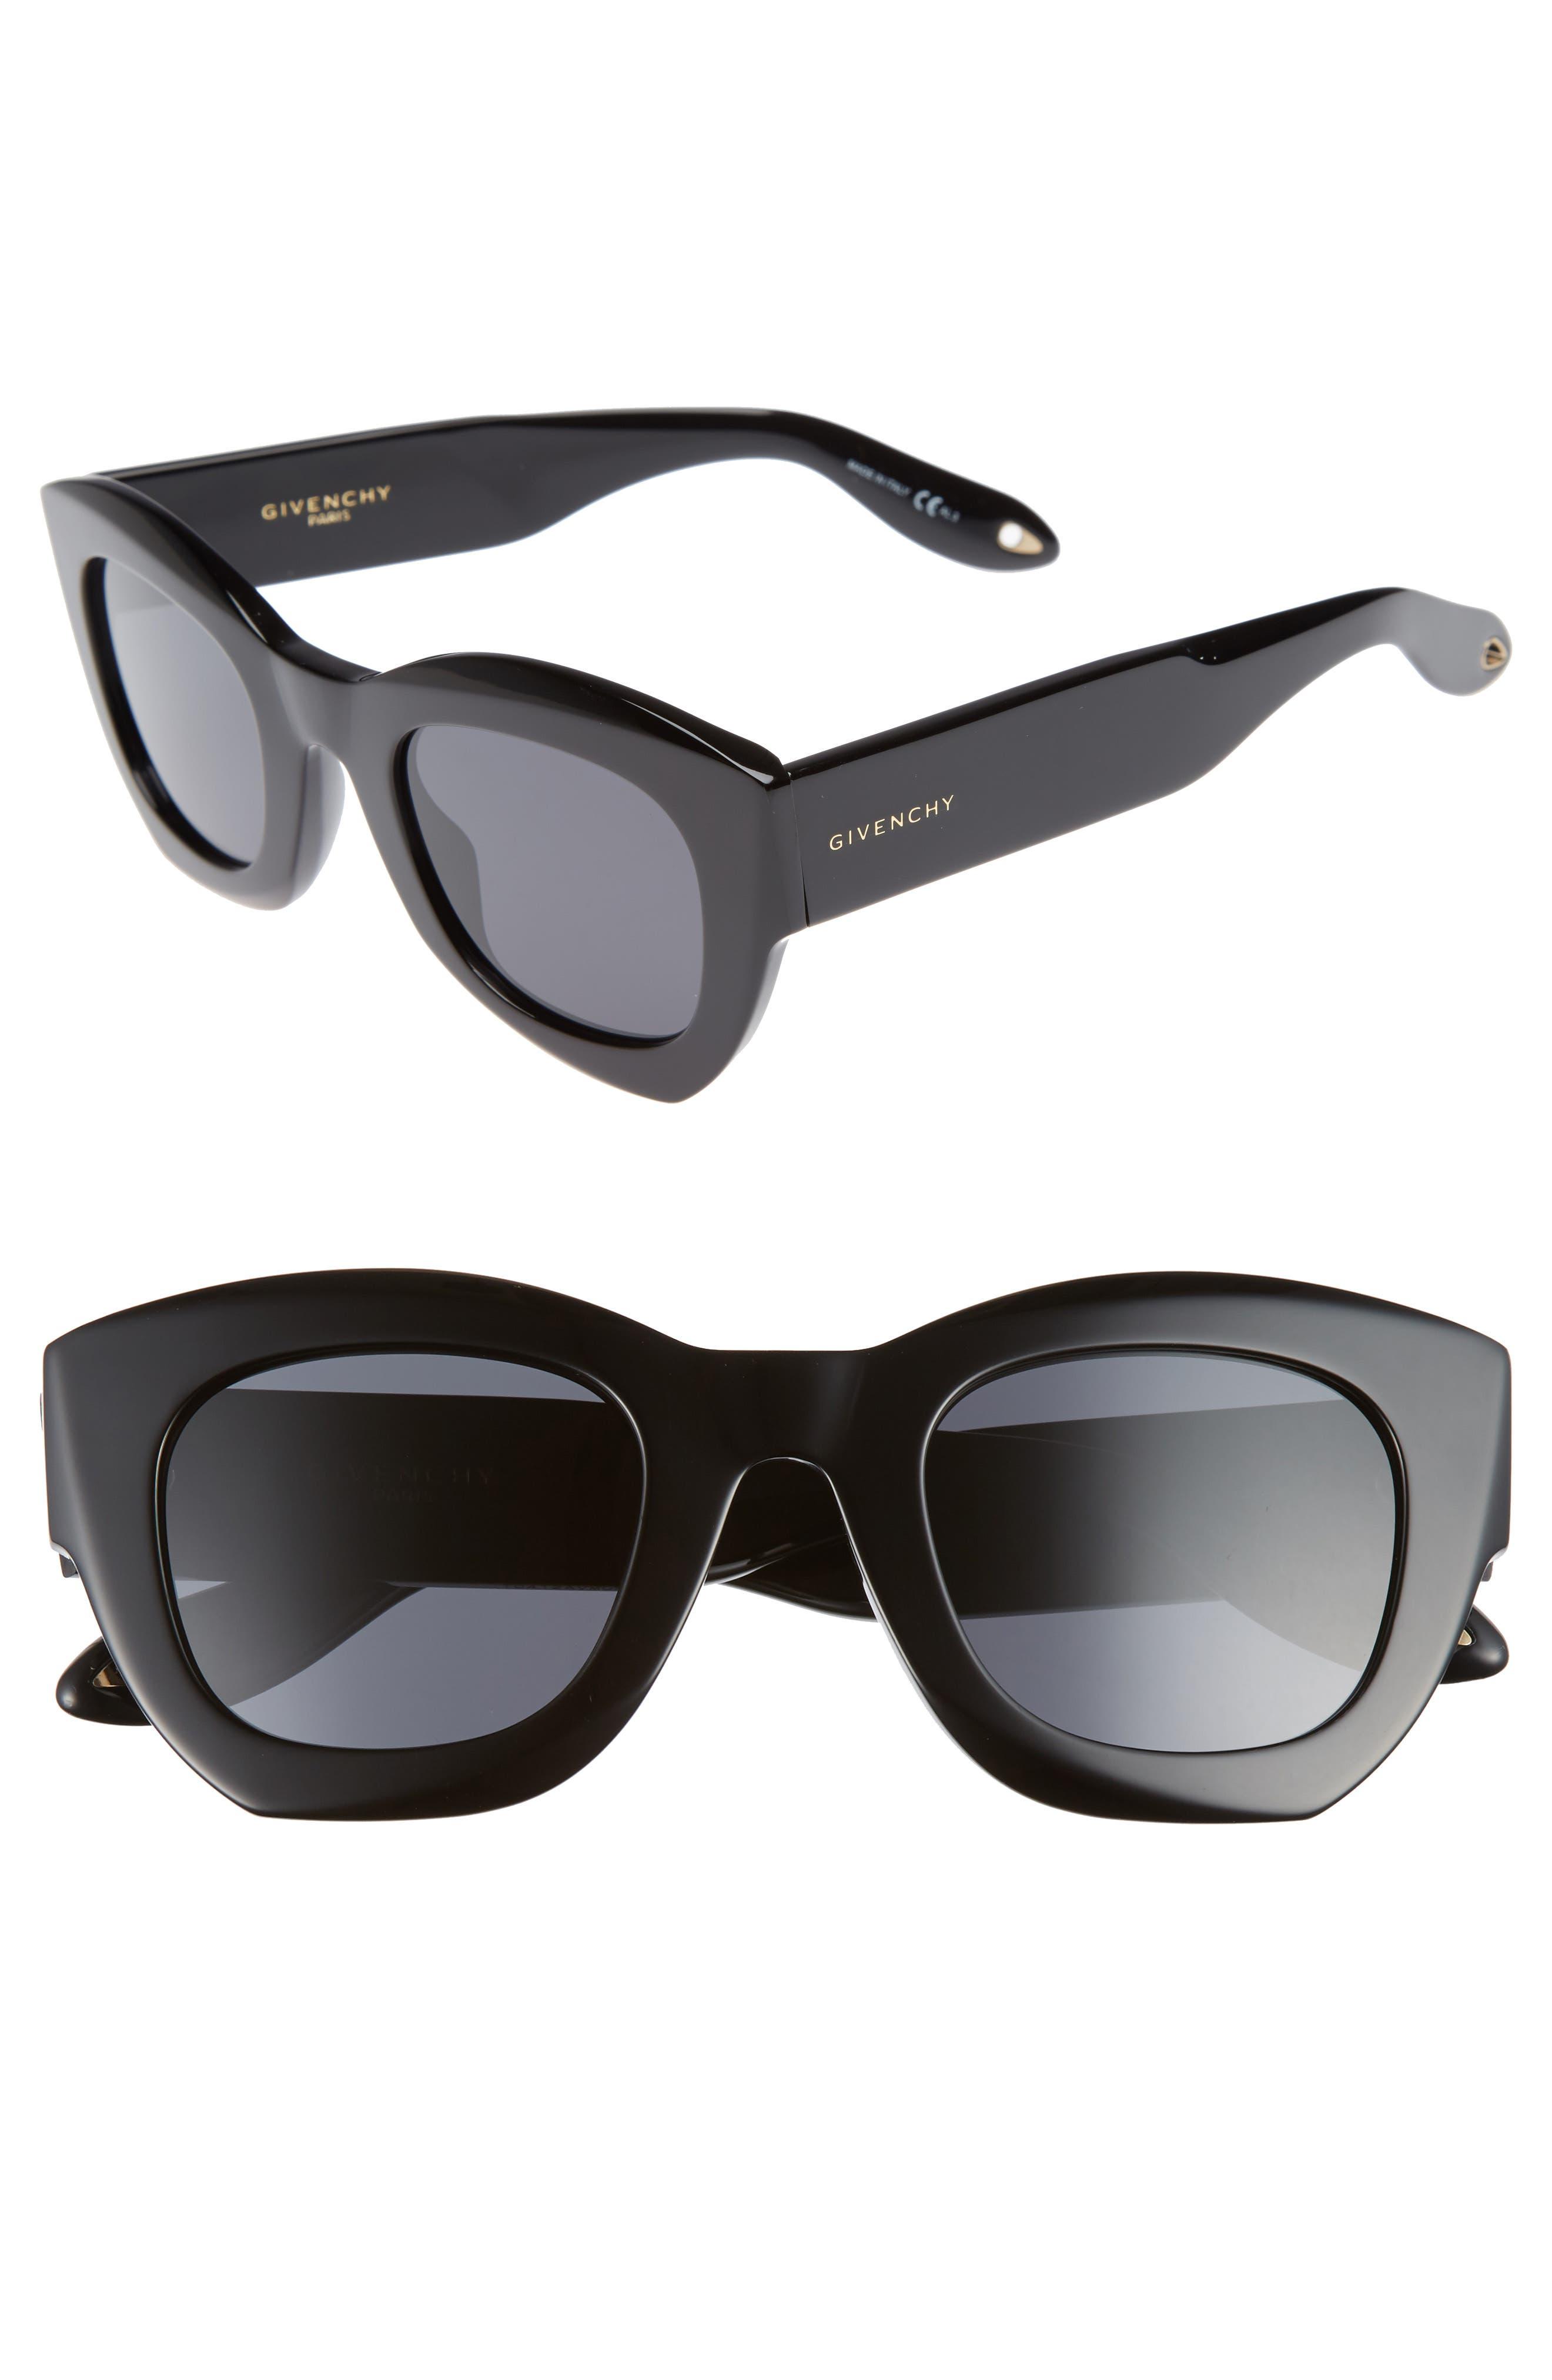 48mm Cat Eye Sunglasses,                             Main thumbnail 1, color,                             001